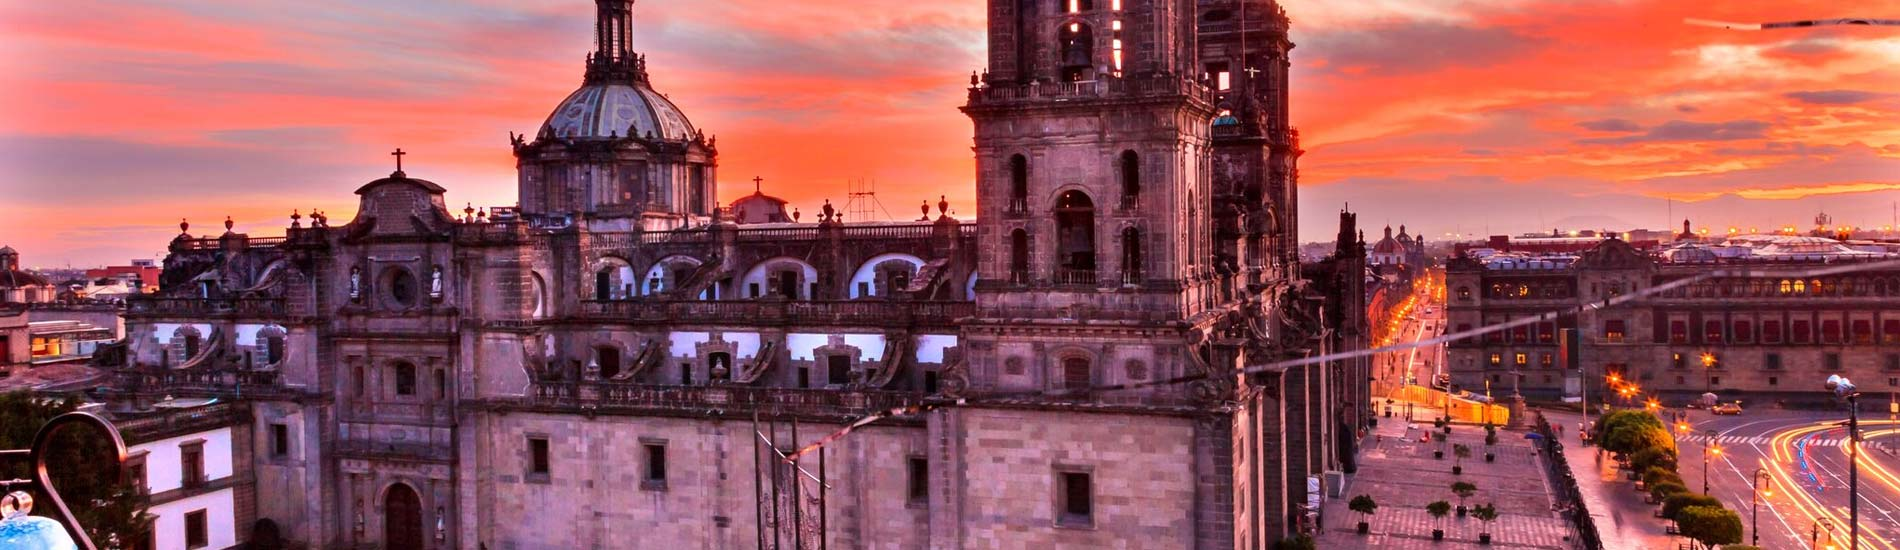 Mexico City Luxury Vacation Experiences